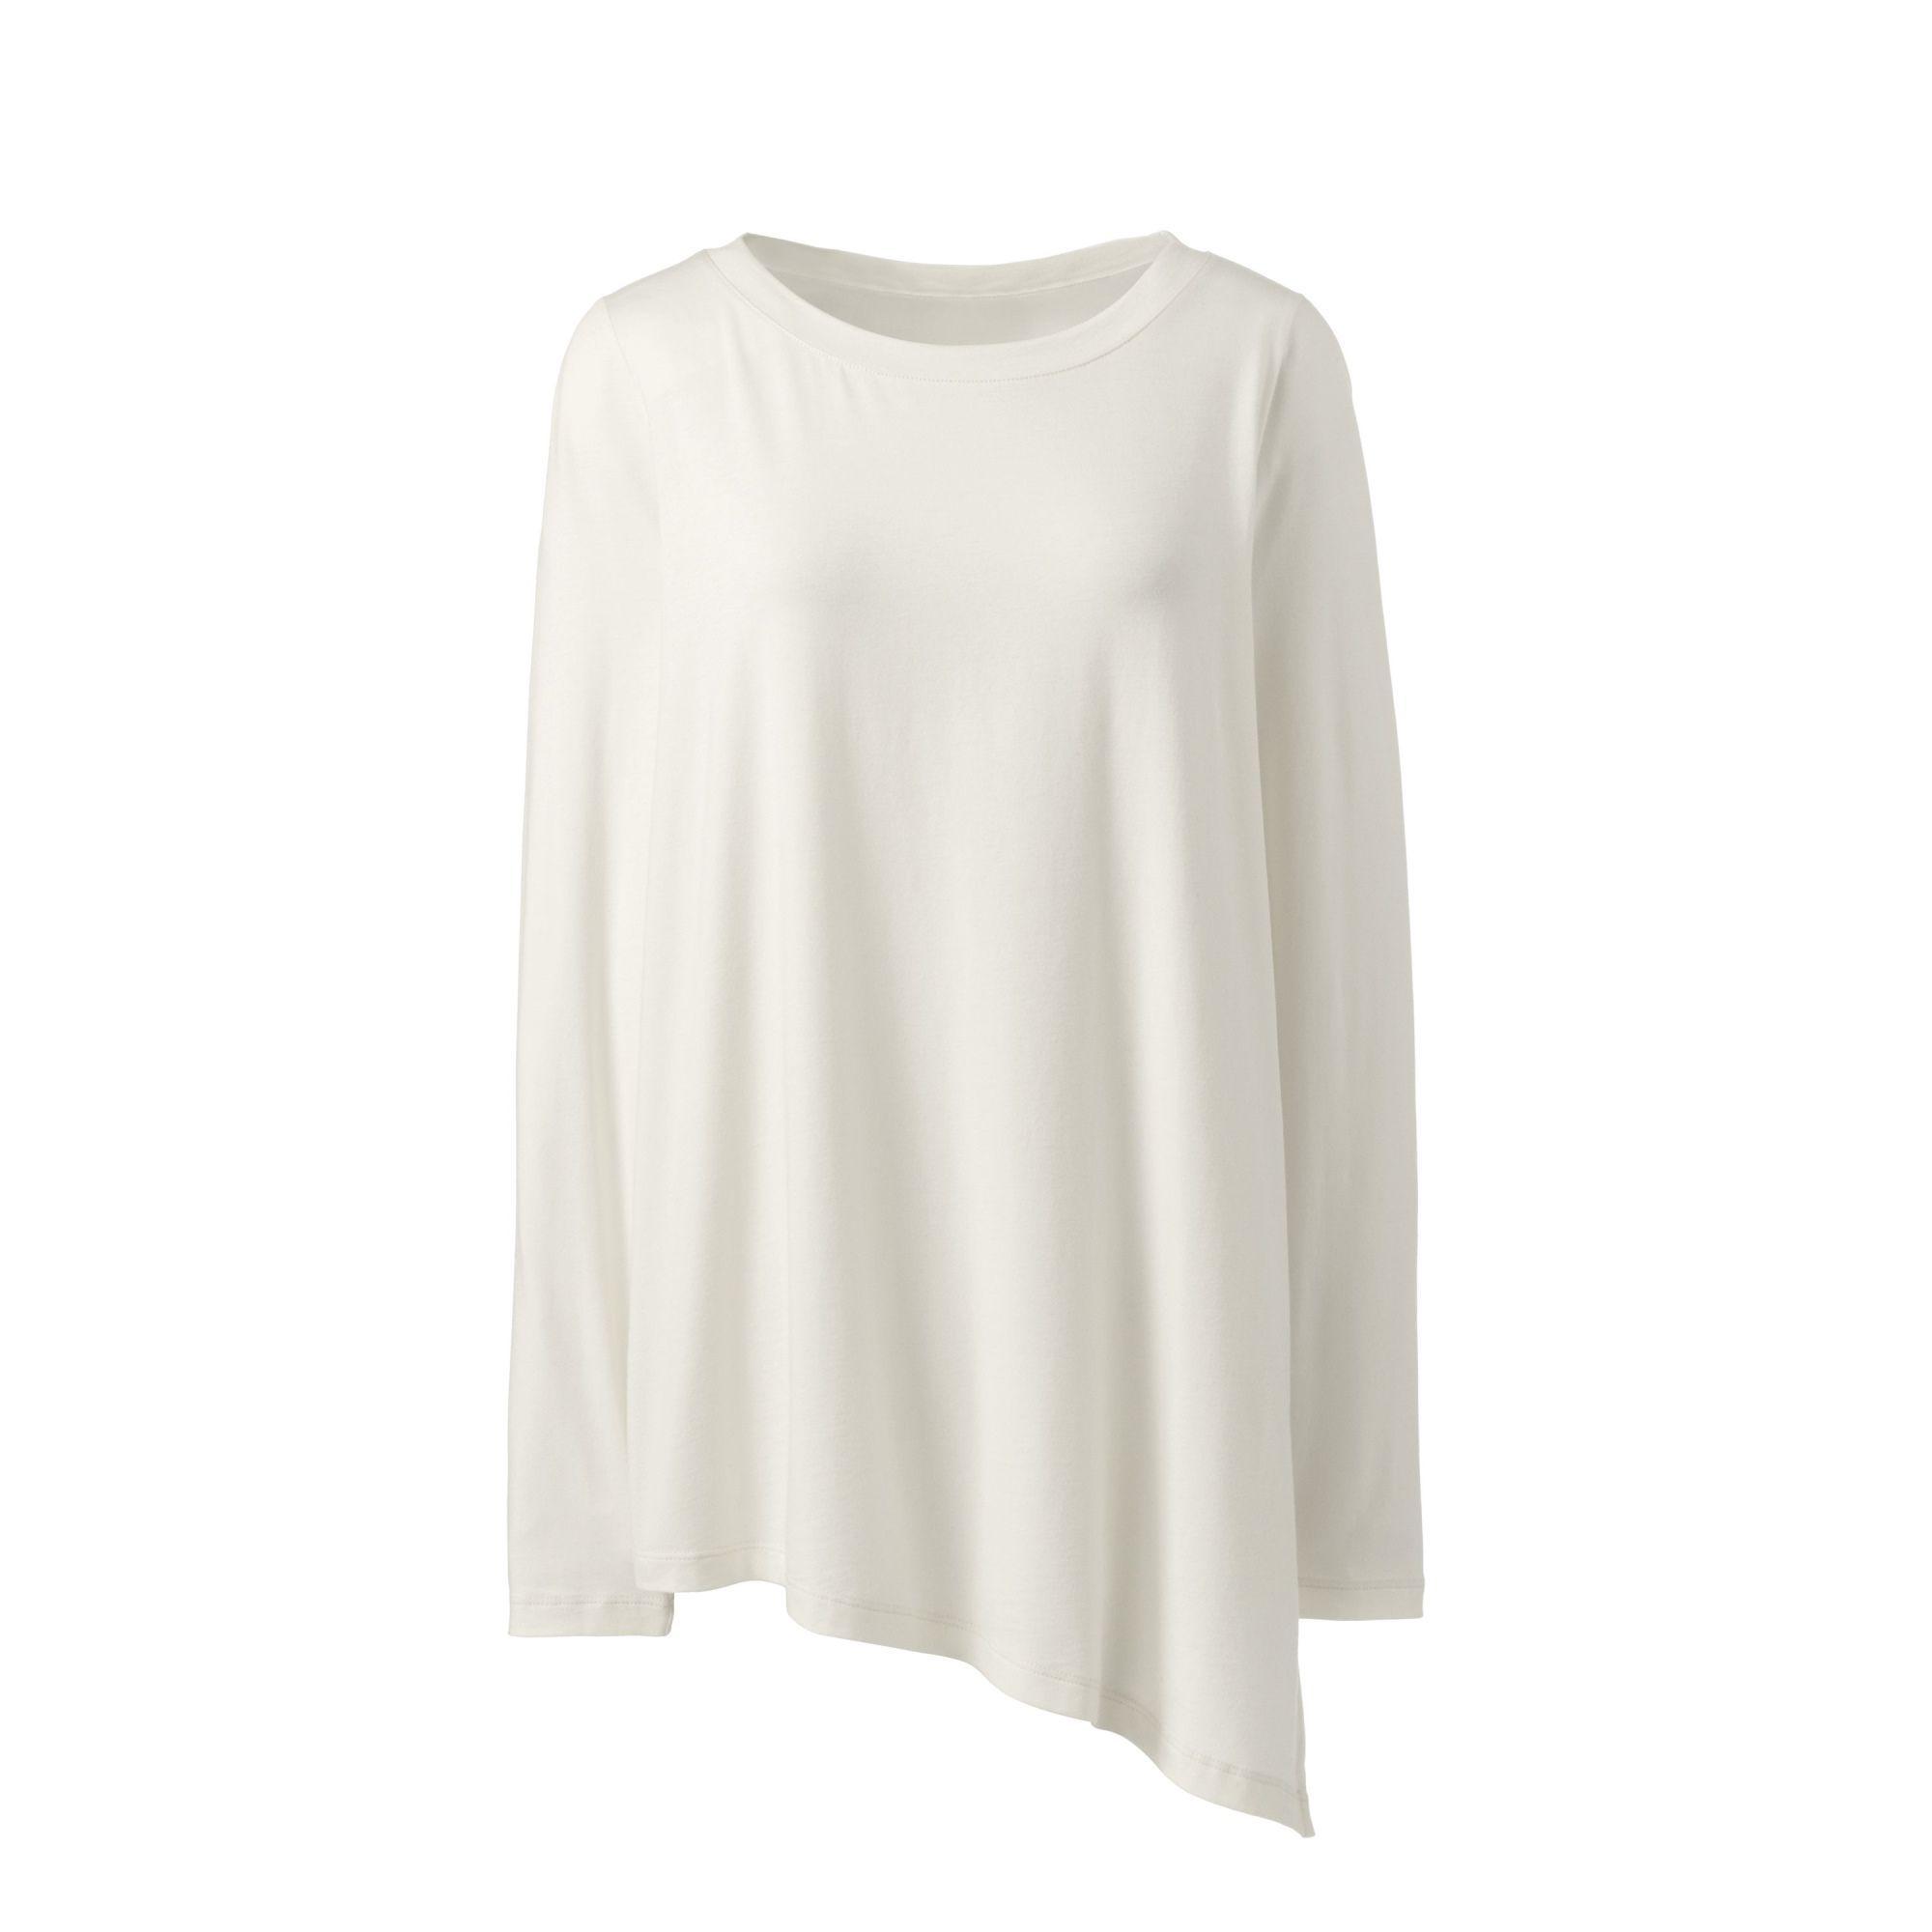 Womens Petite Cotton Modal Sleep Vest - 10 -12 - Grey Lands End Fast Shipping b0FYjw4yt